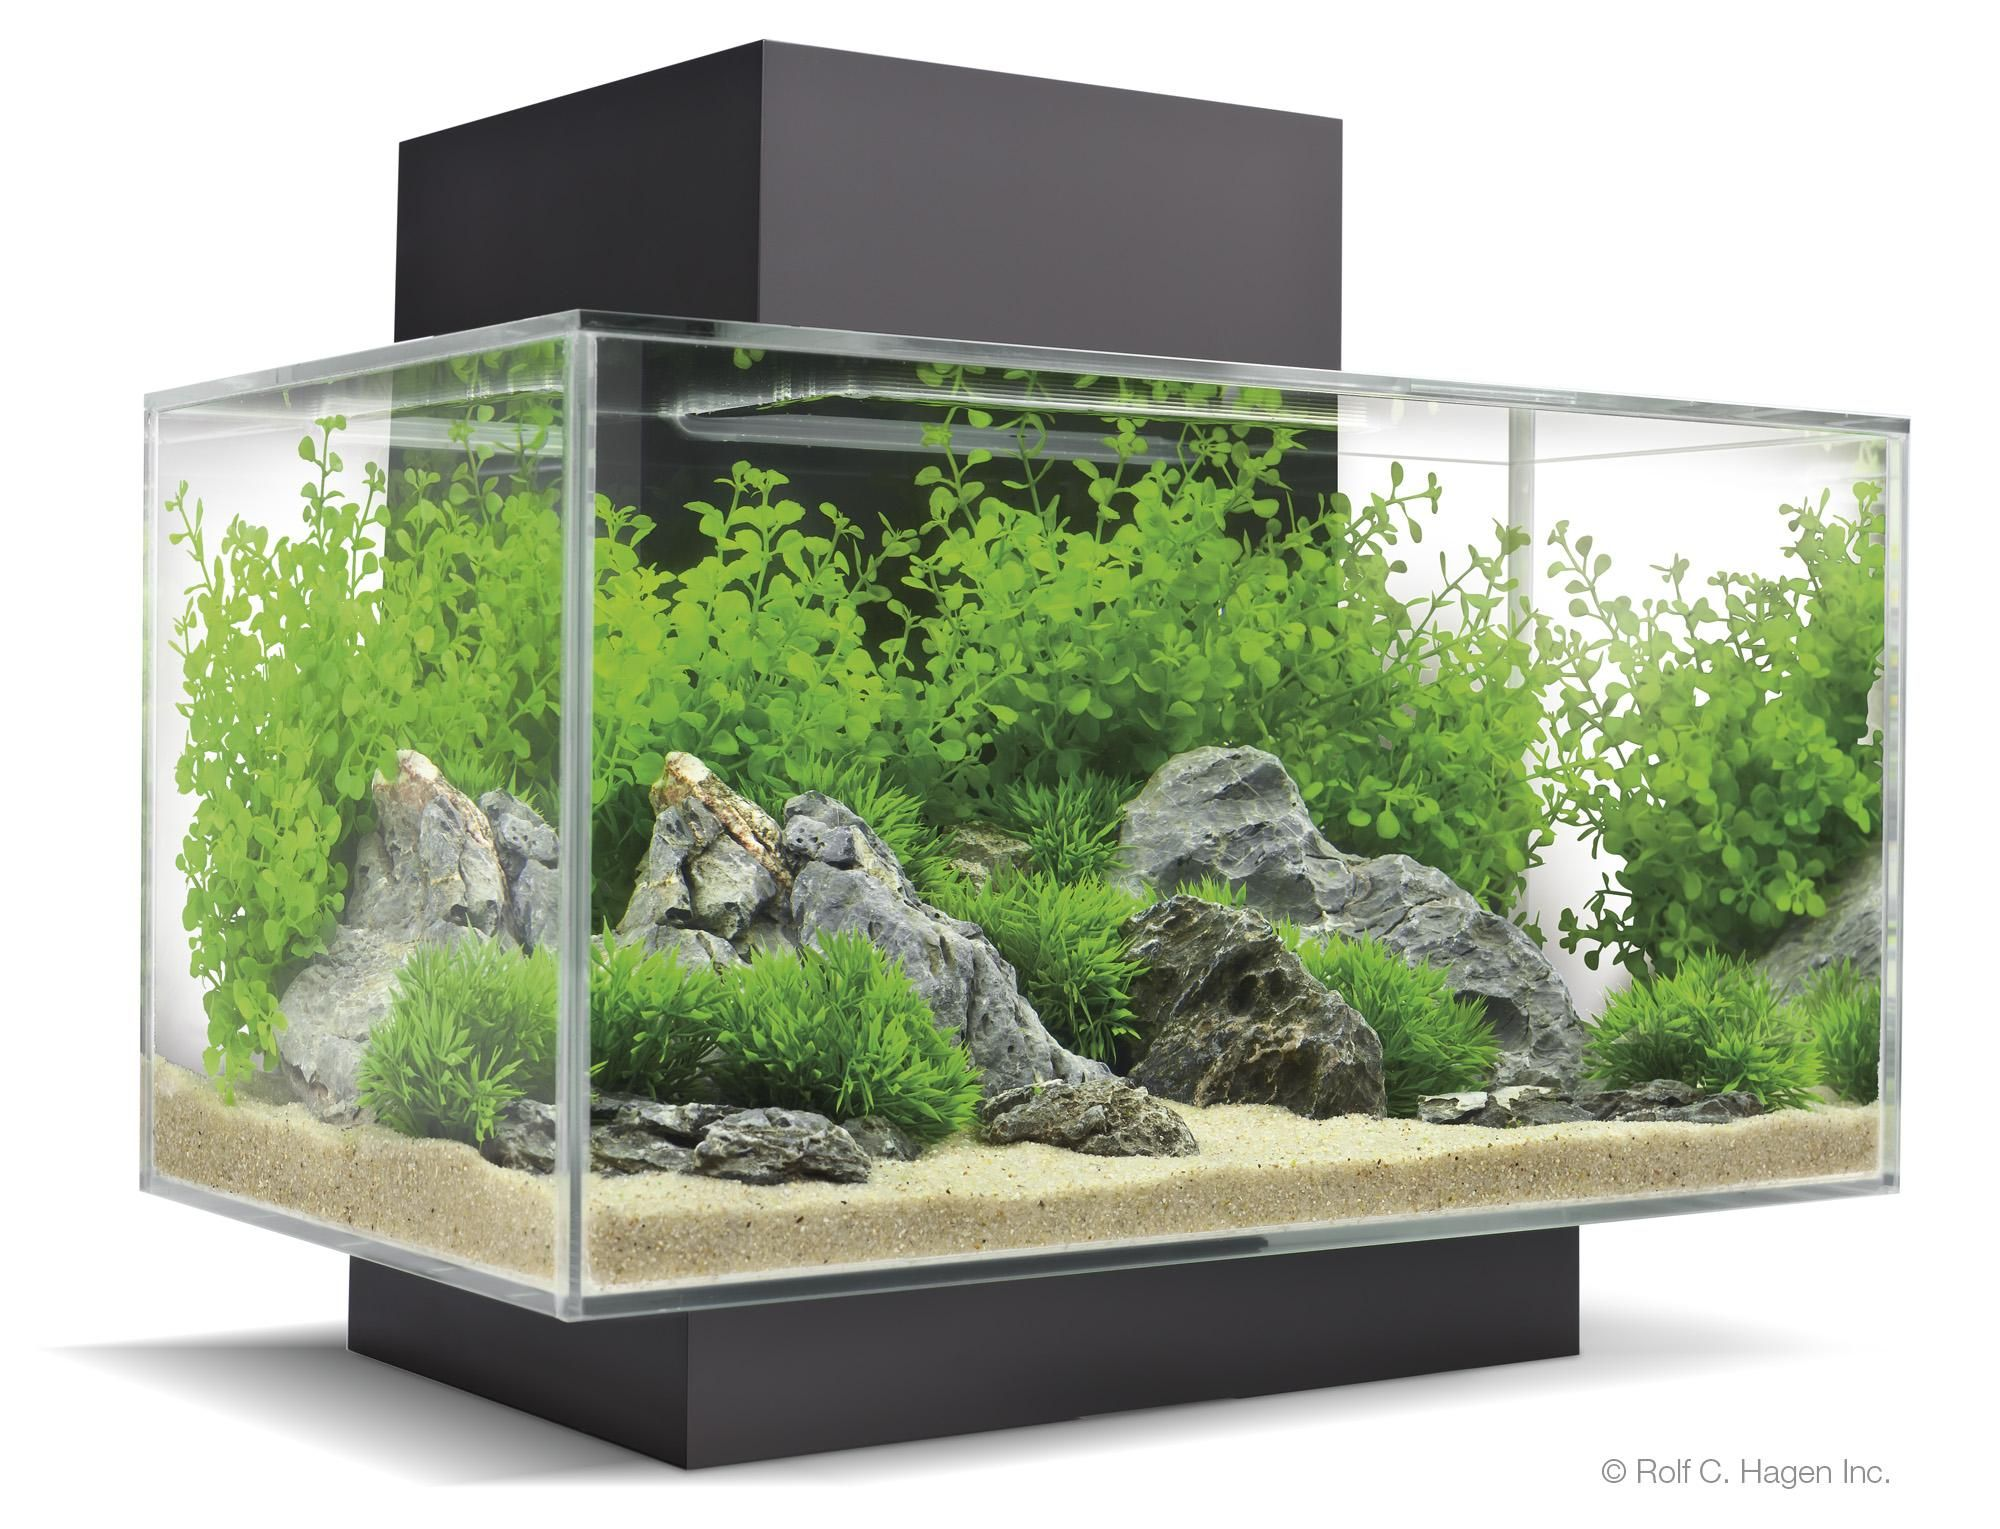 Fluval Edge Fish Aquarium Tank Plant Glass with LED Light 6 Gal